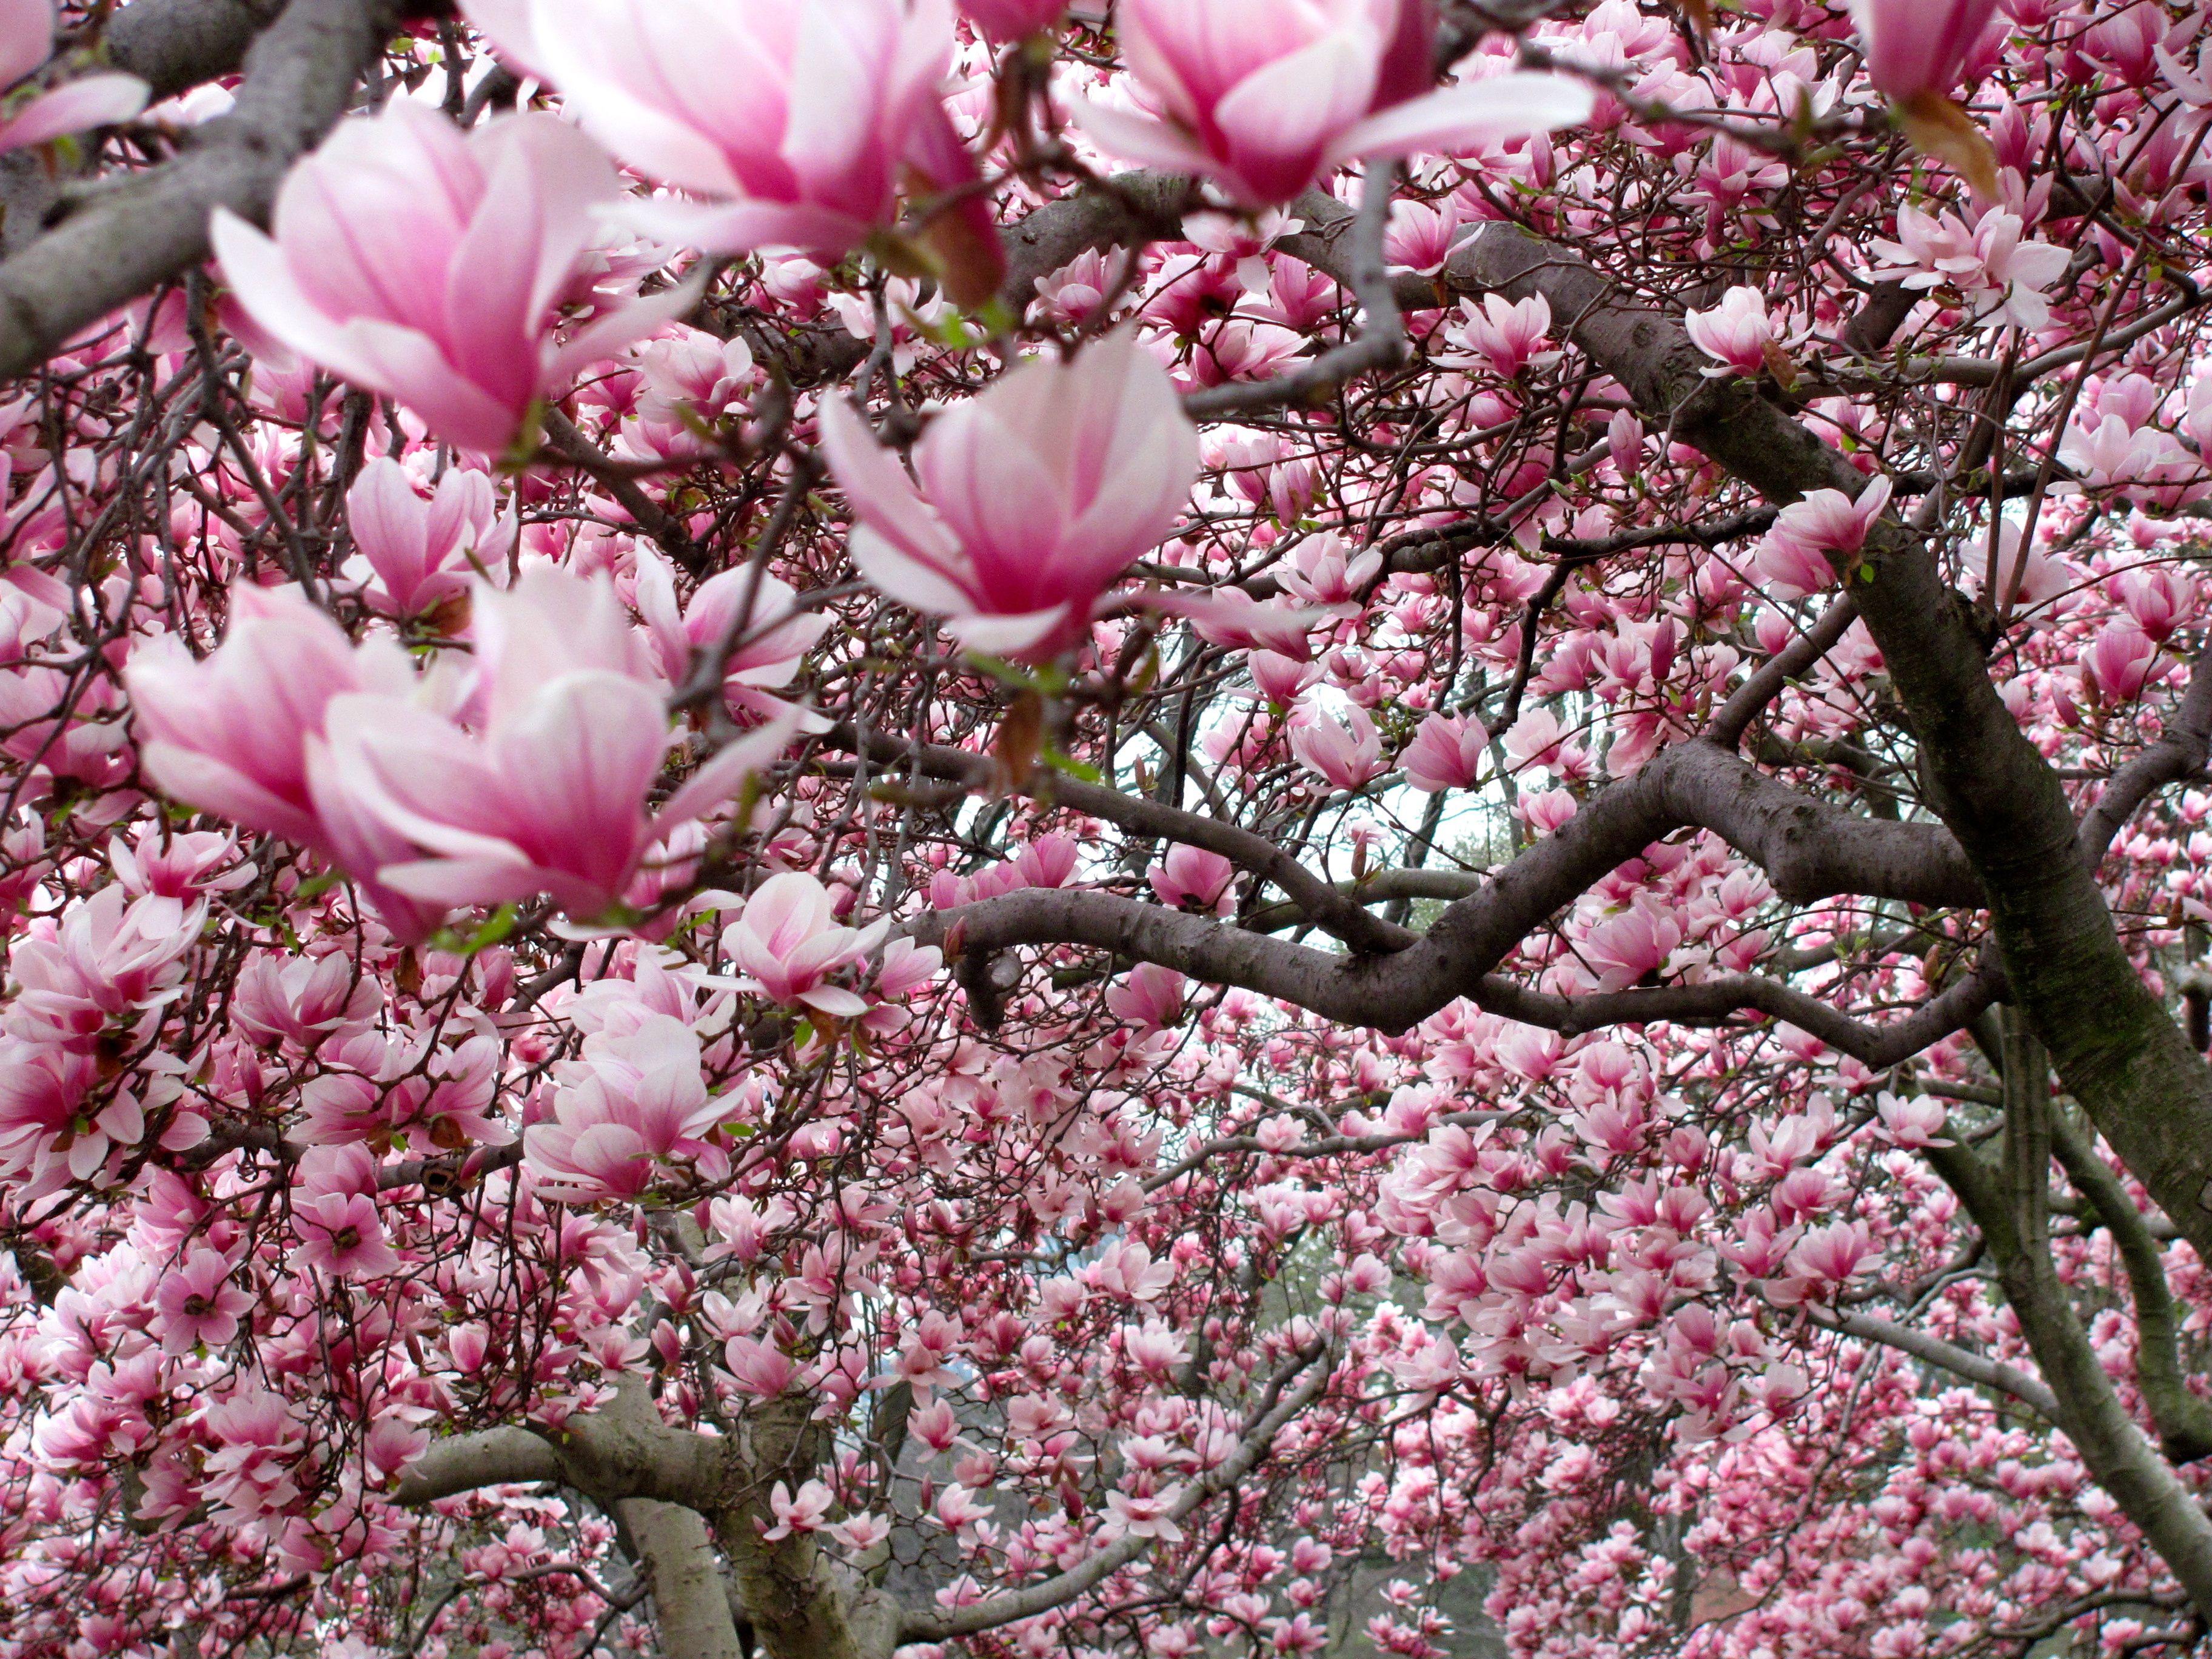 A Grove Or Shall I Say An Avenue Full Of Magnolia Trees On Full